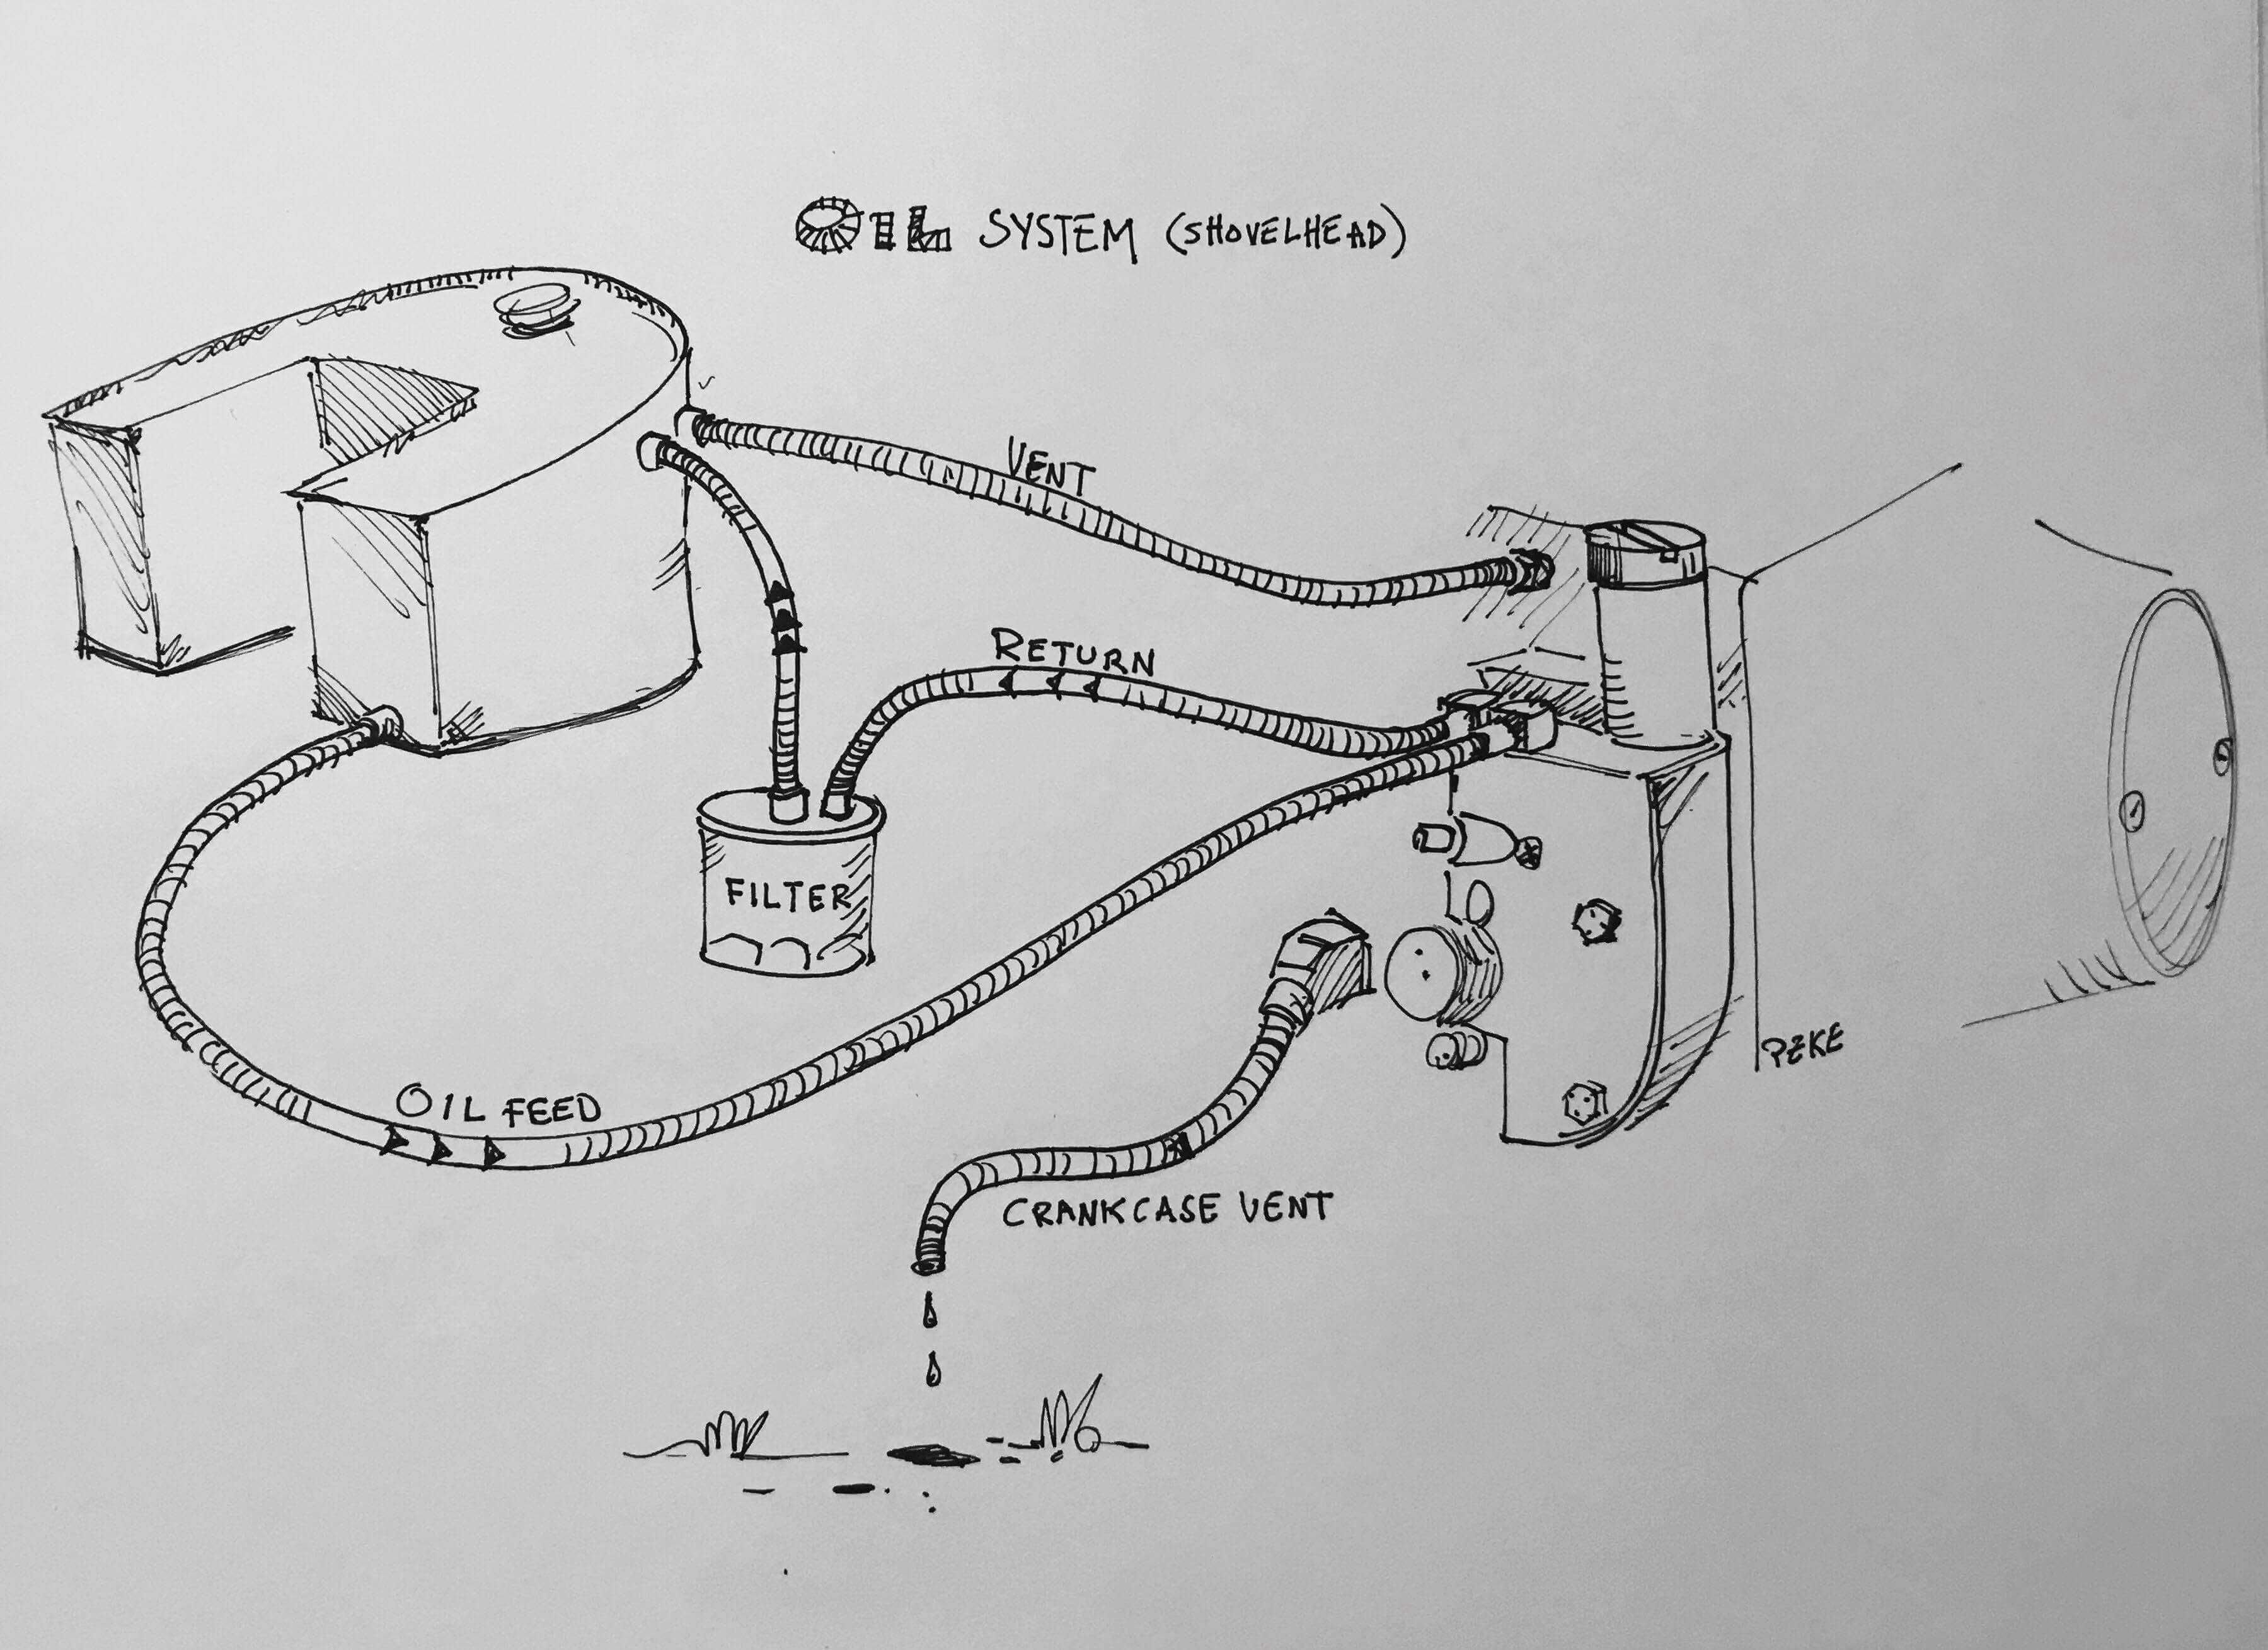 medium resolution of system schematic further harley shovelhead oil system diagram on diagram for engine also sportster oil line